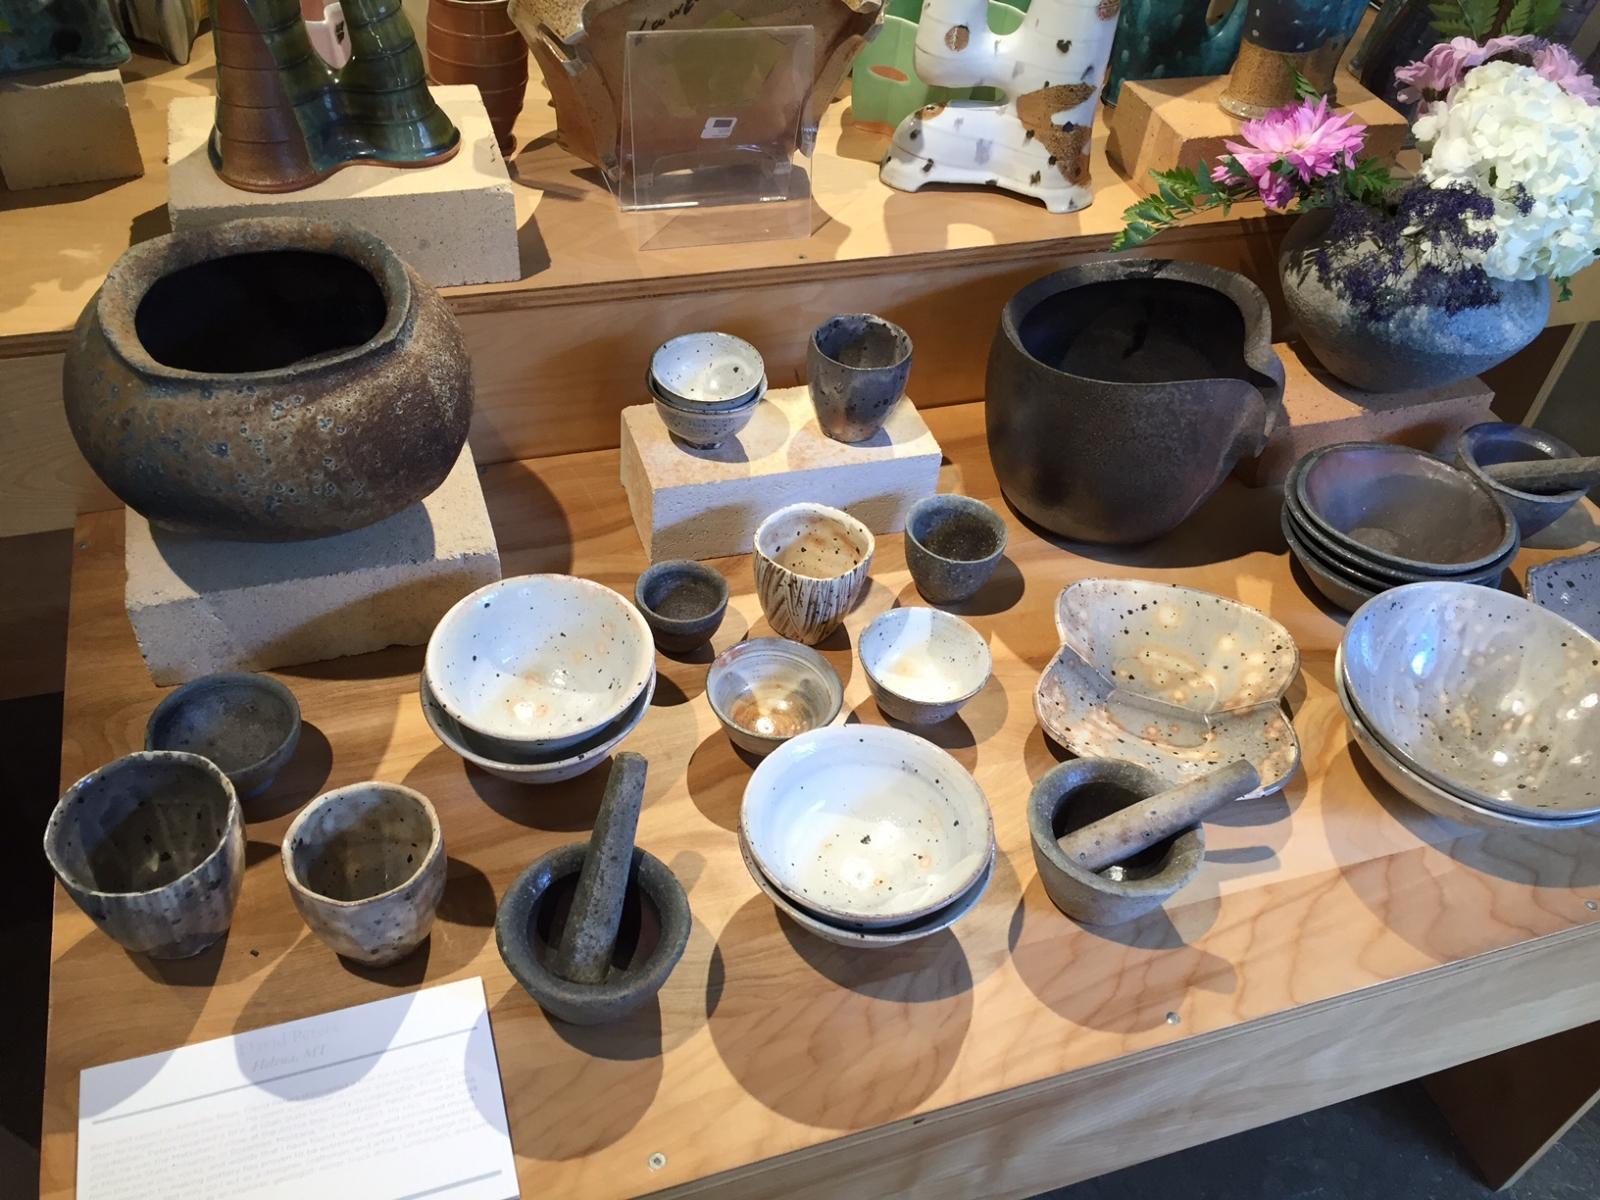 american pottery festival, northern clay center, local art, art, fundraiser, events, ceramics, minnesota journeys